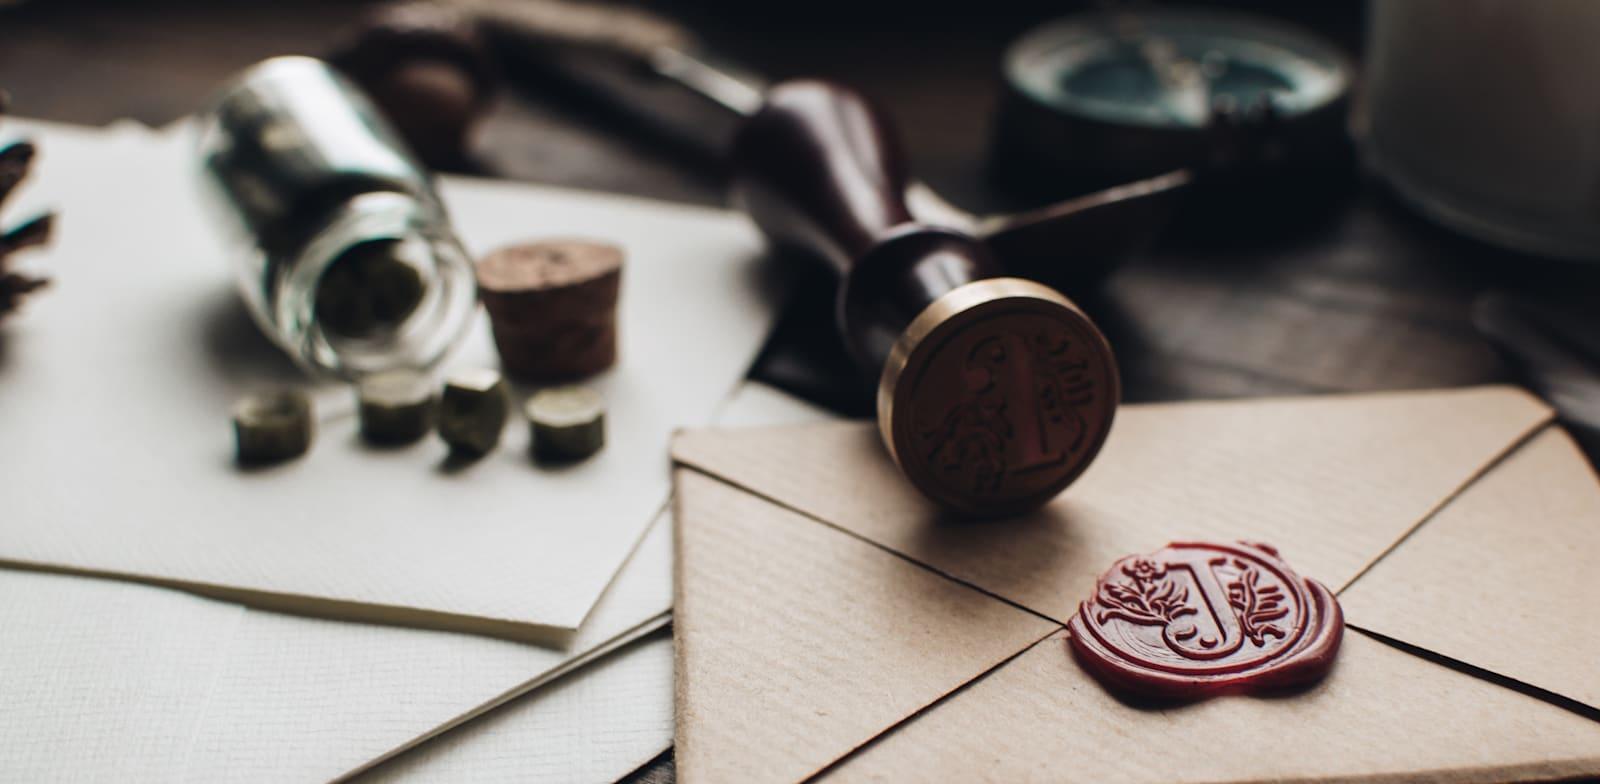 מכתב / אילוסטרציה: Shutterstock, Julia Martyniuk